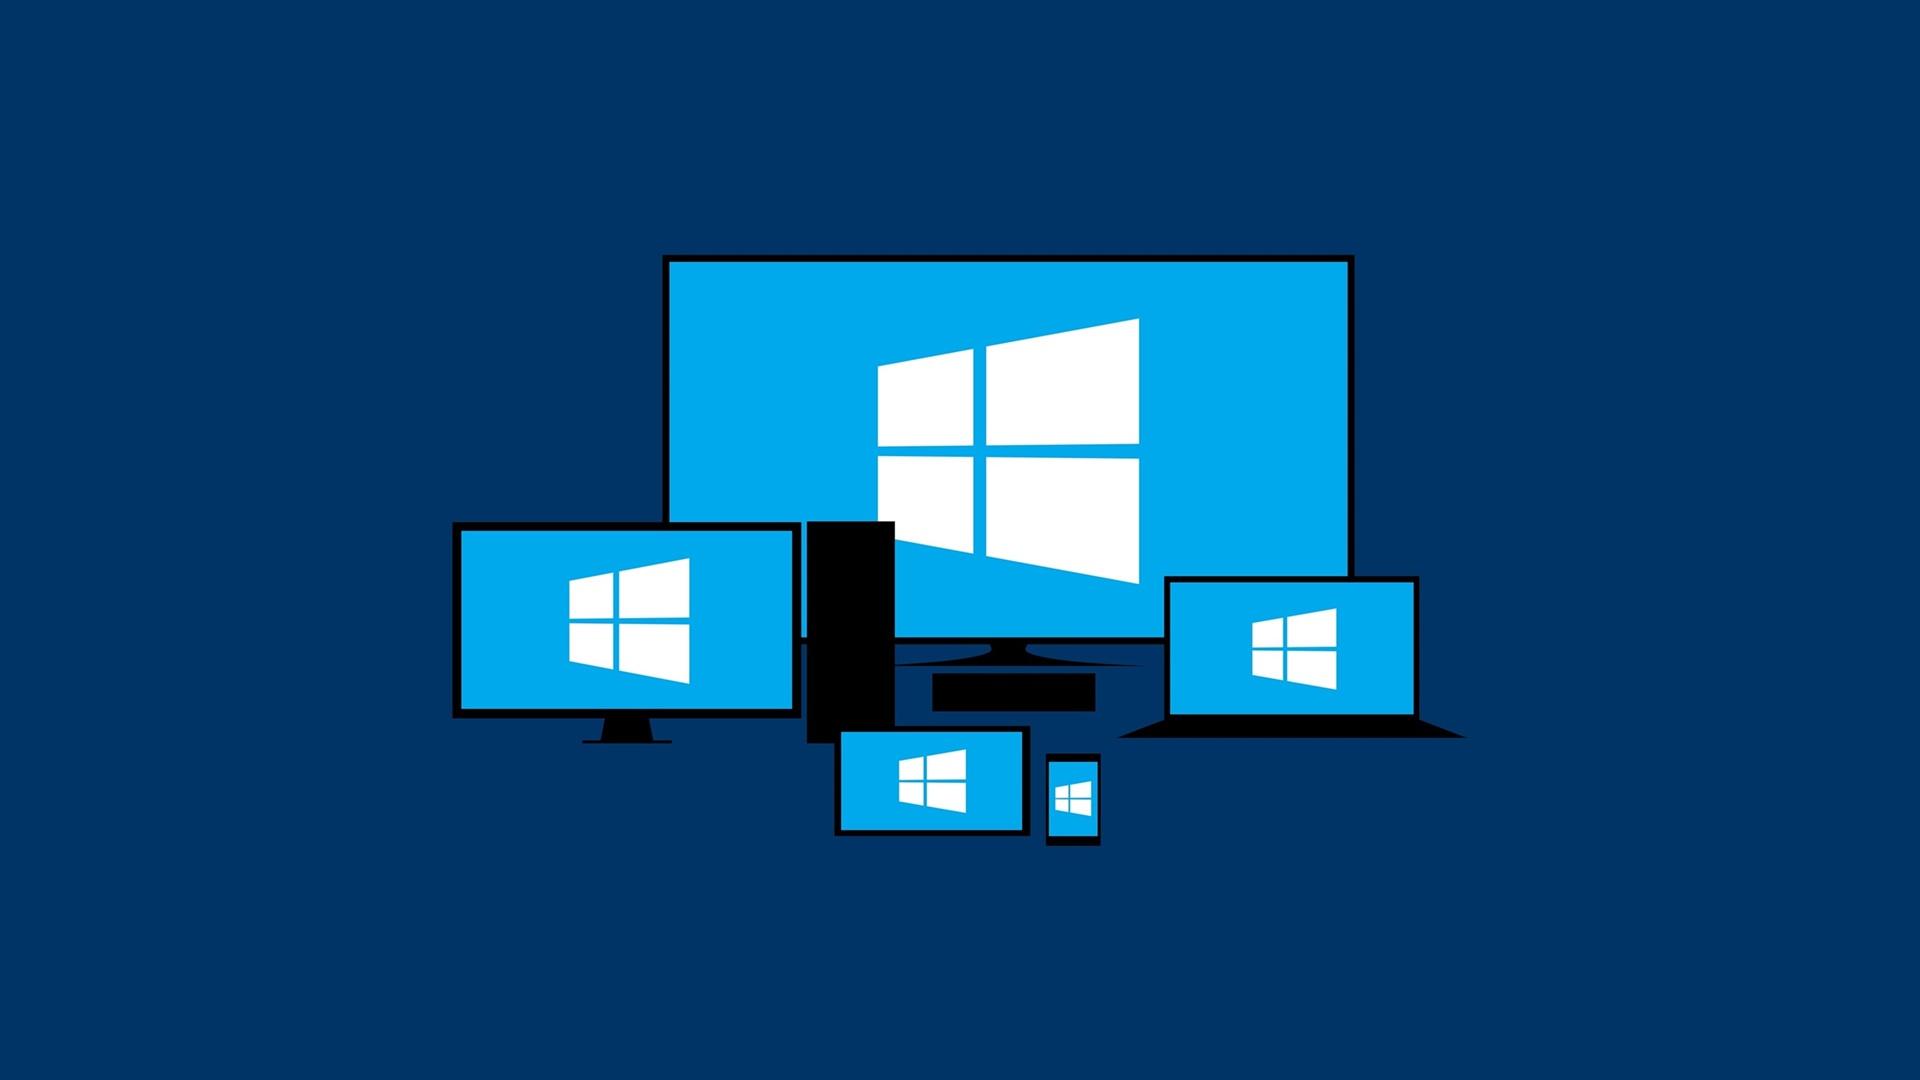 microsoft, windows, windows 10, insider preview, insider